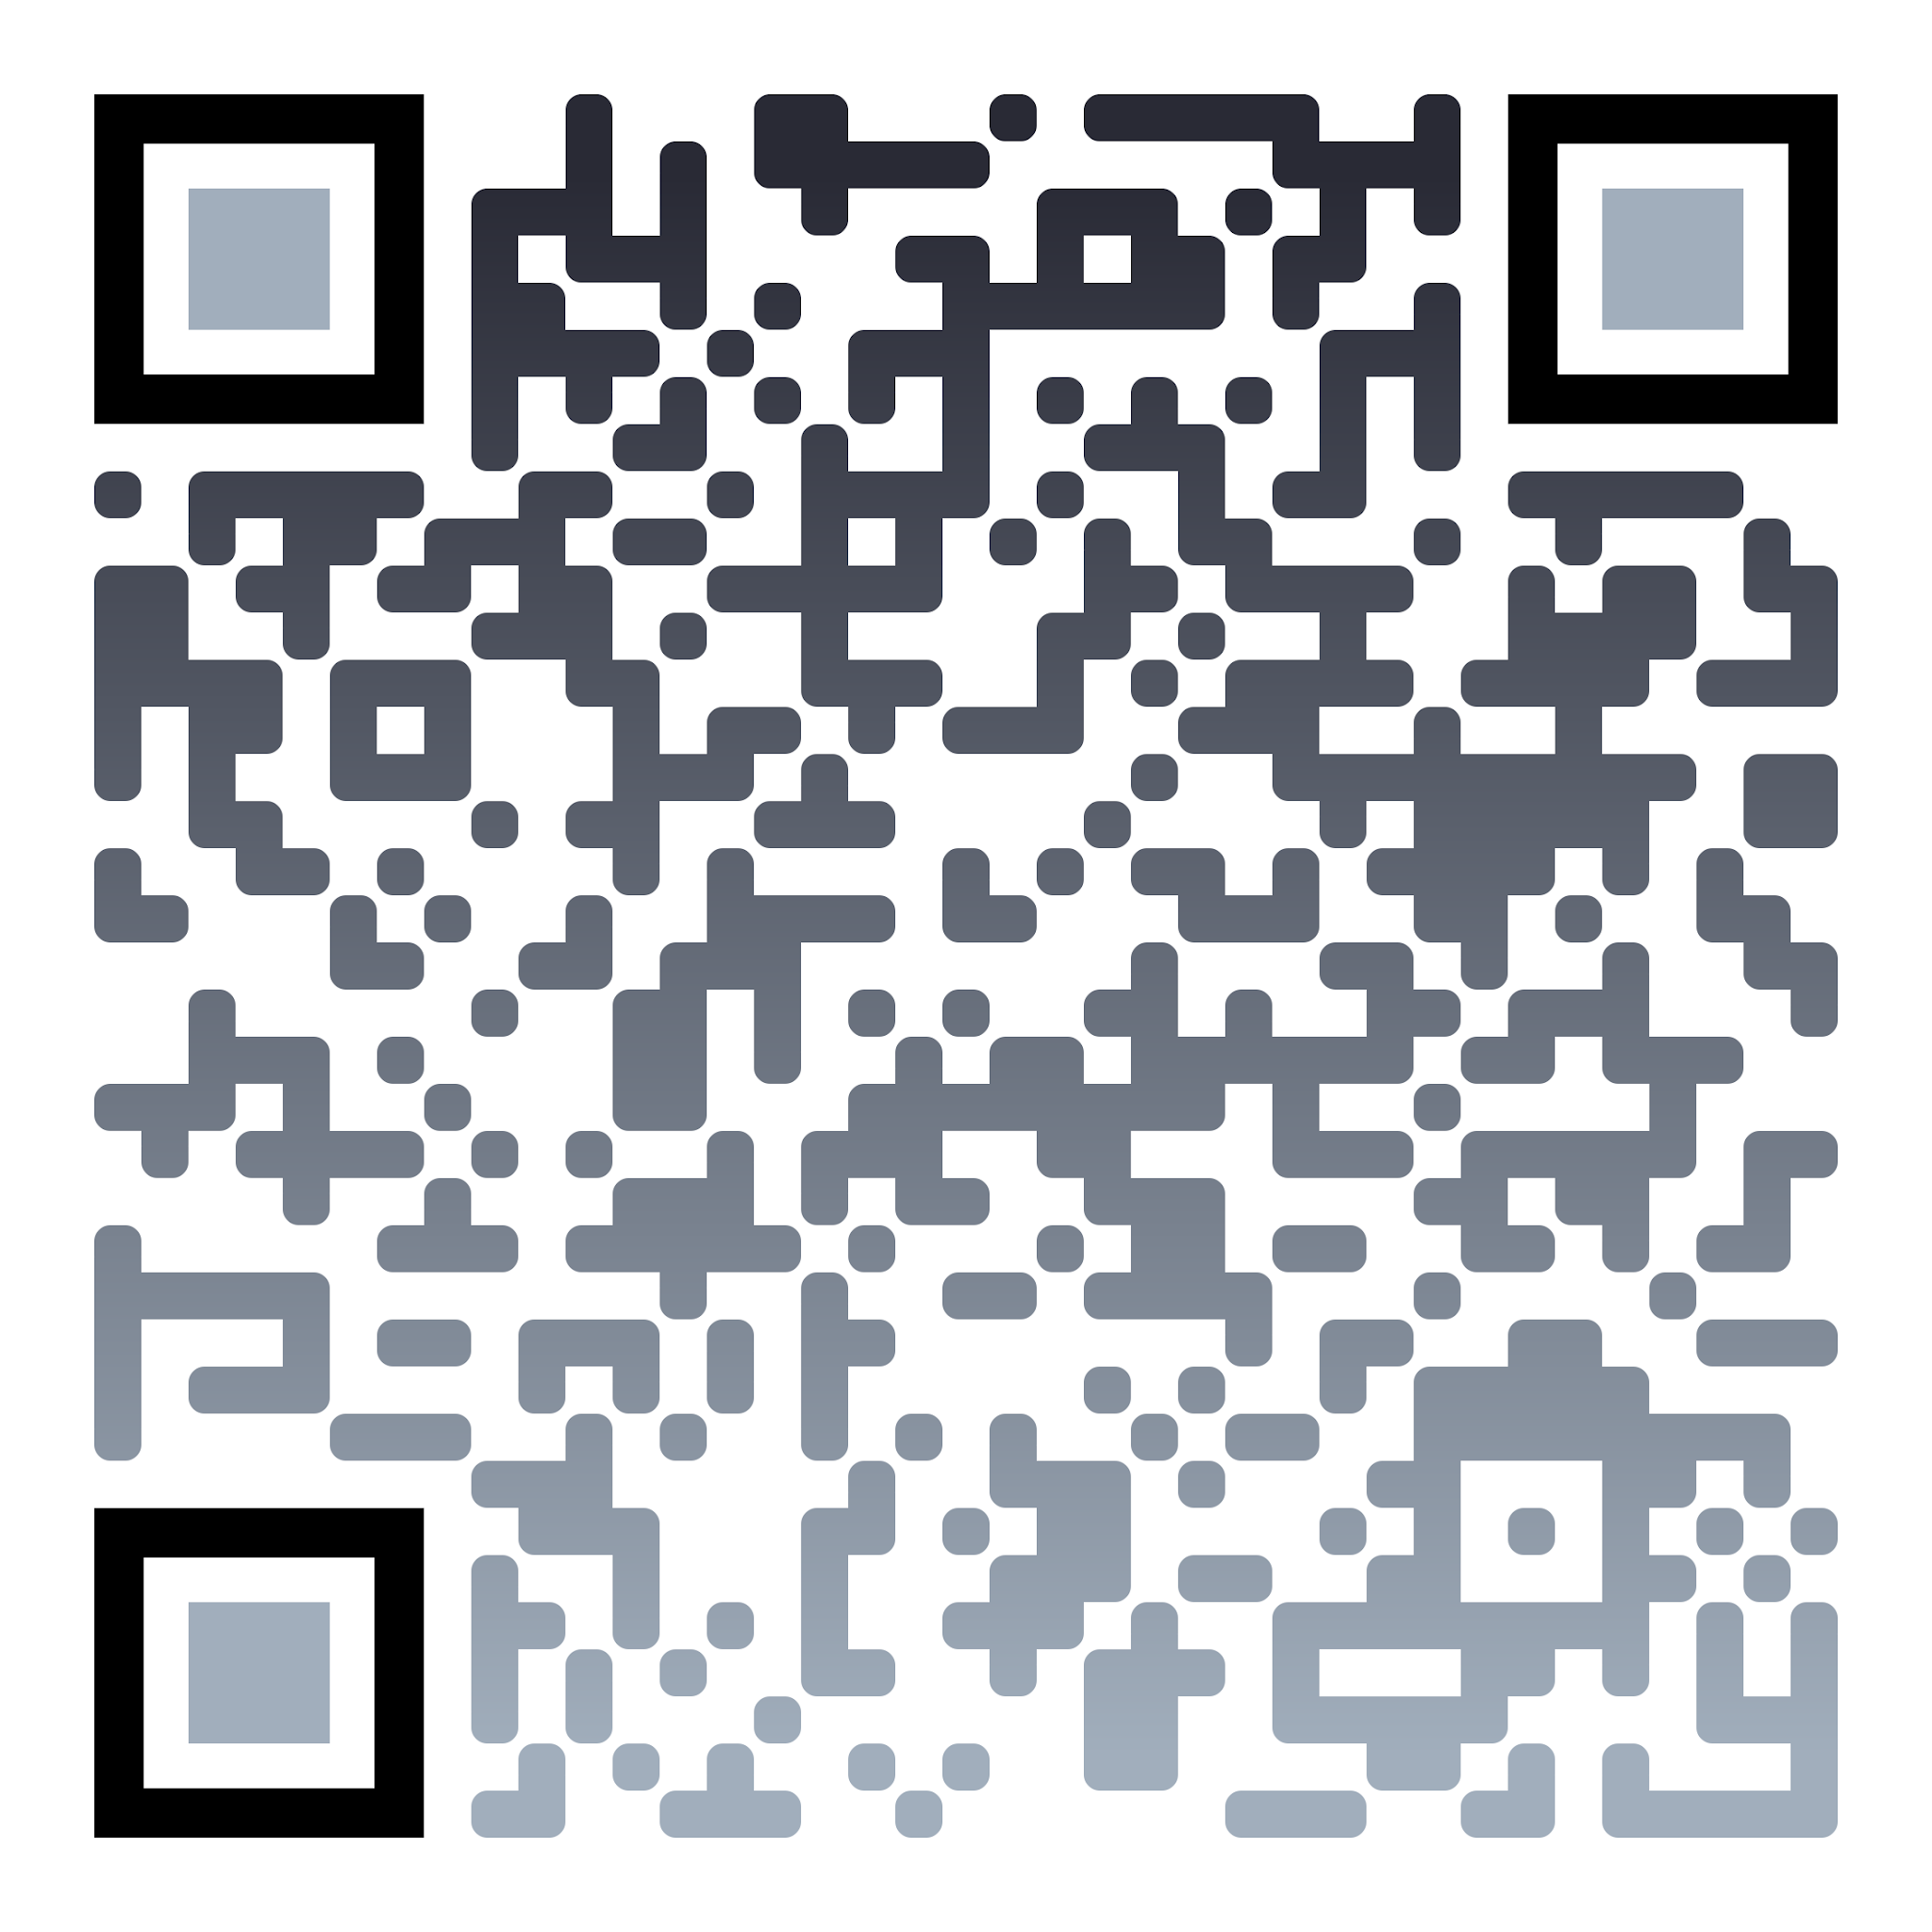 qr code robux Roblox Codes